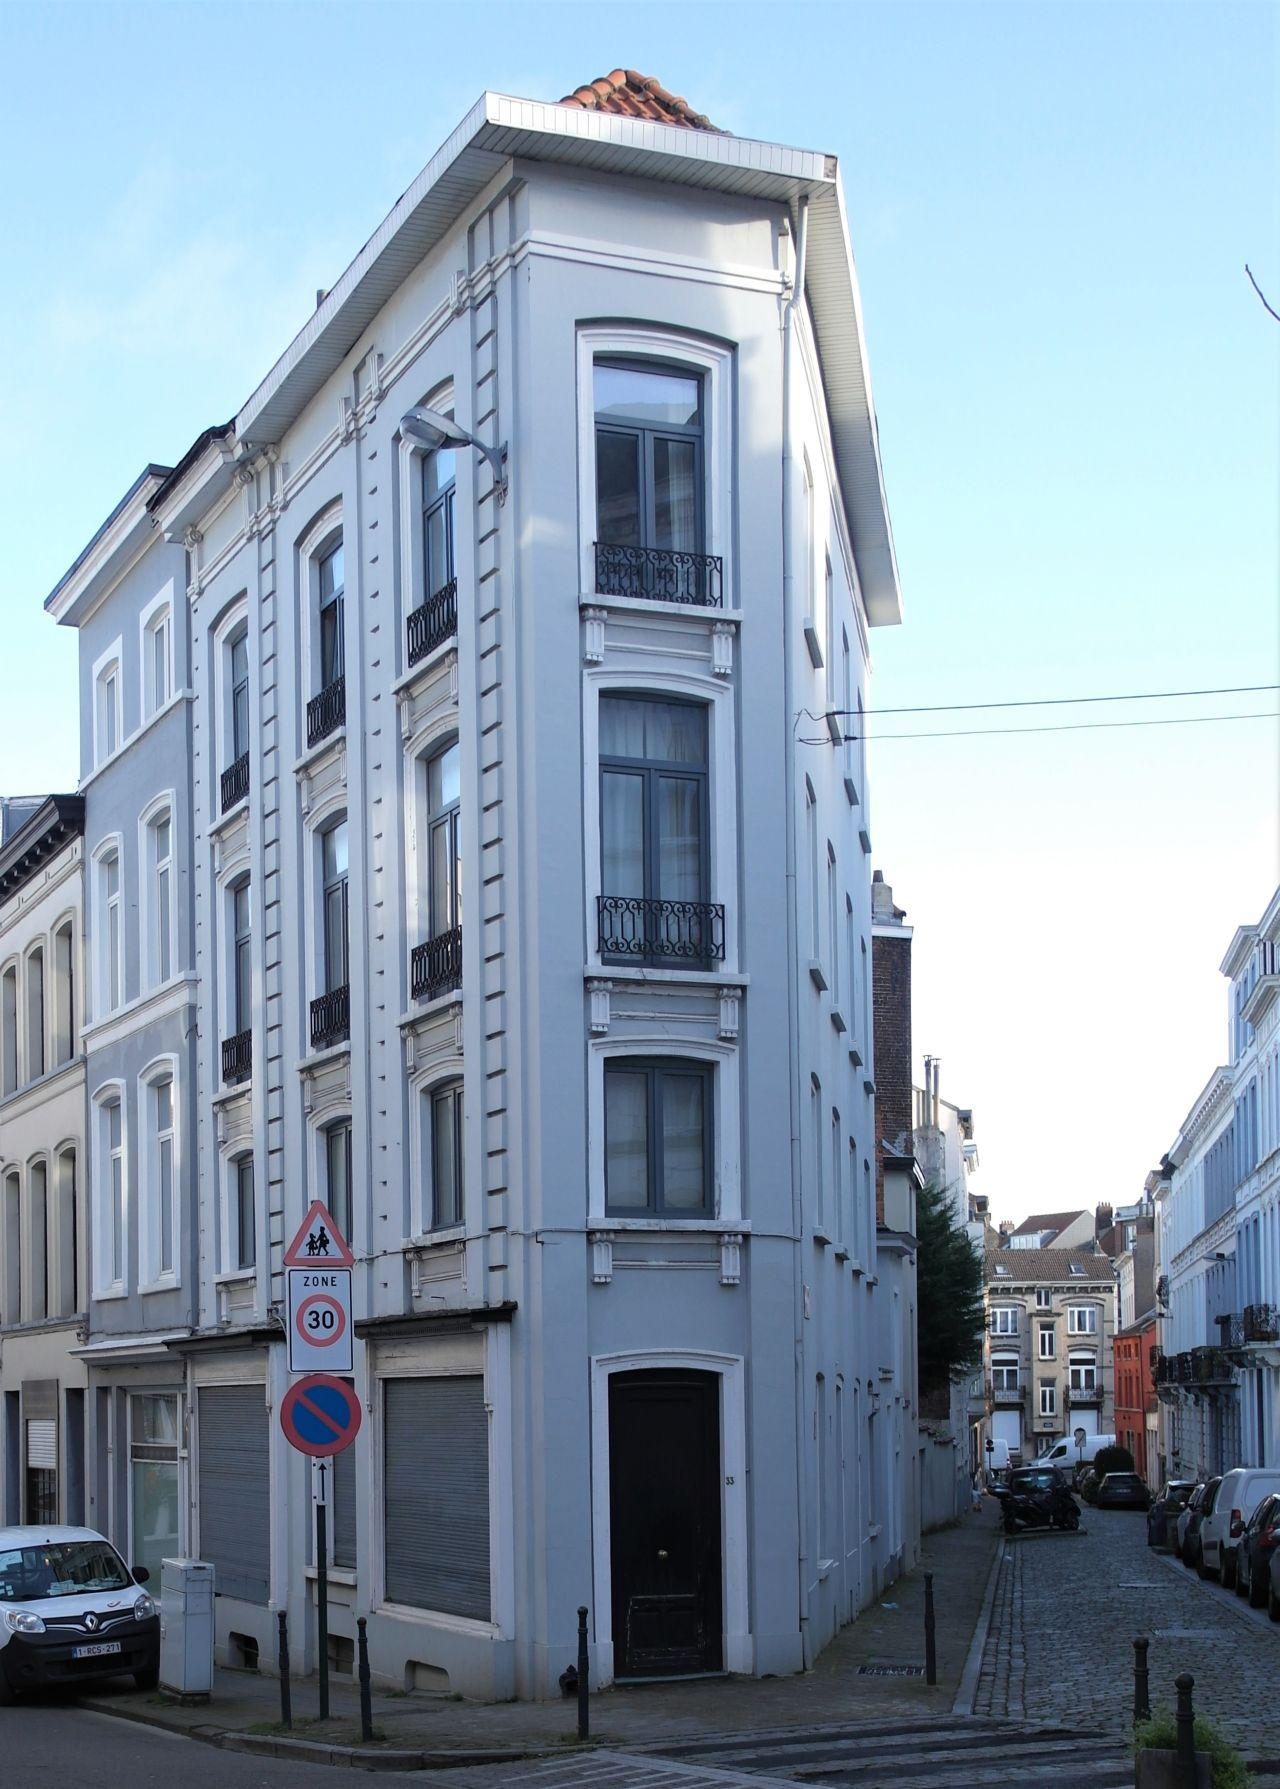 Rue de Spa 33 - 2 rue du Berceau et rue de Spa 34 - 4 rue du Berceau, 2020